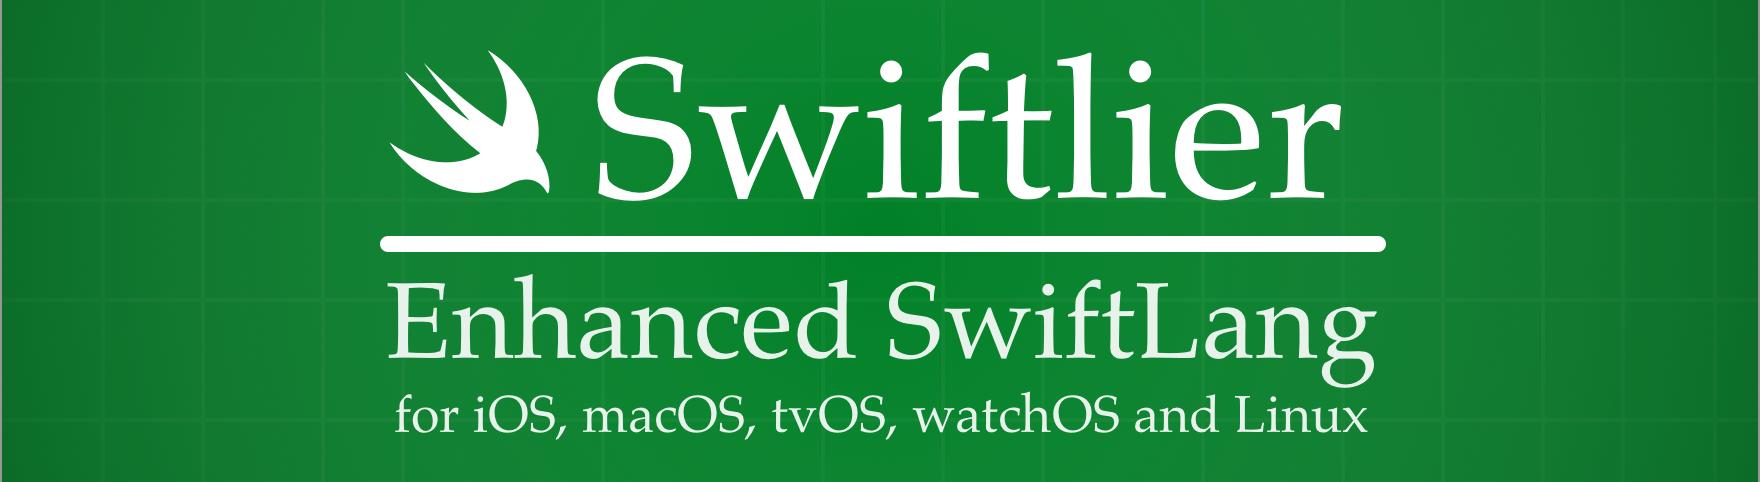 Swiftlier - Enhanced SwiftLang